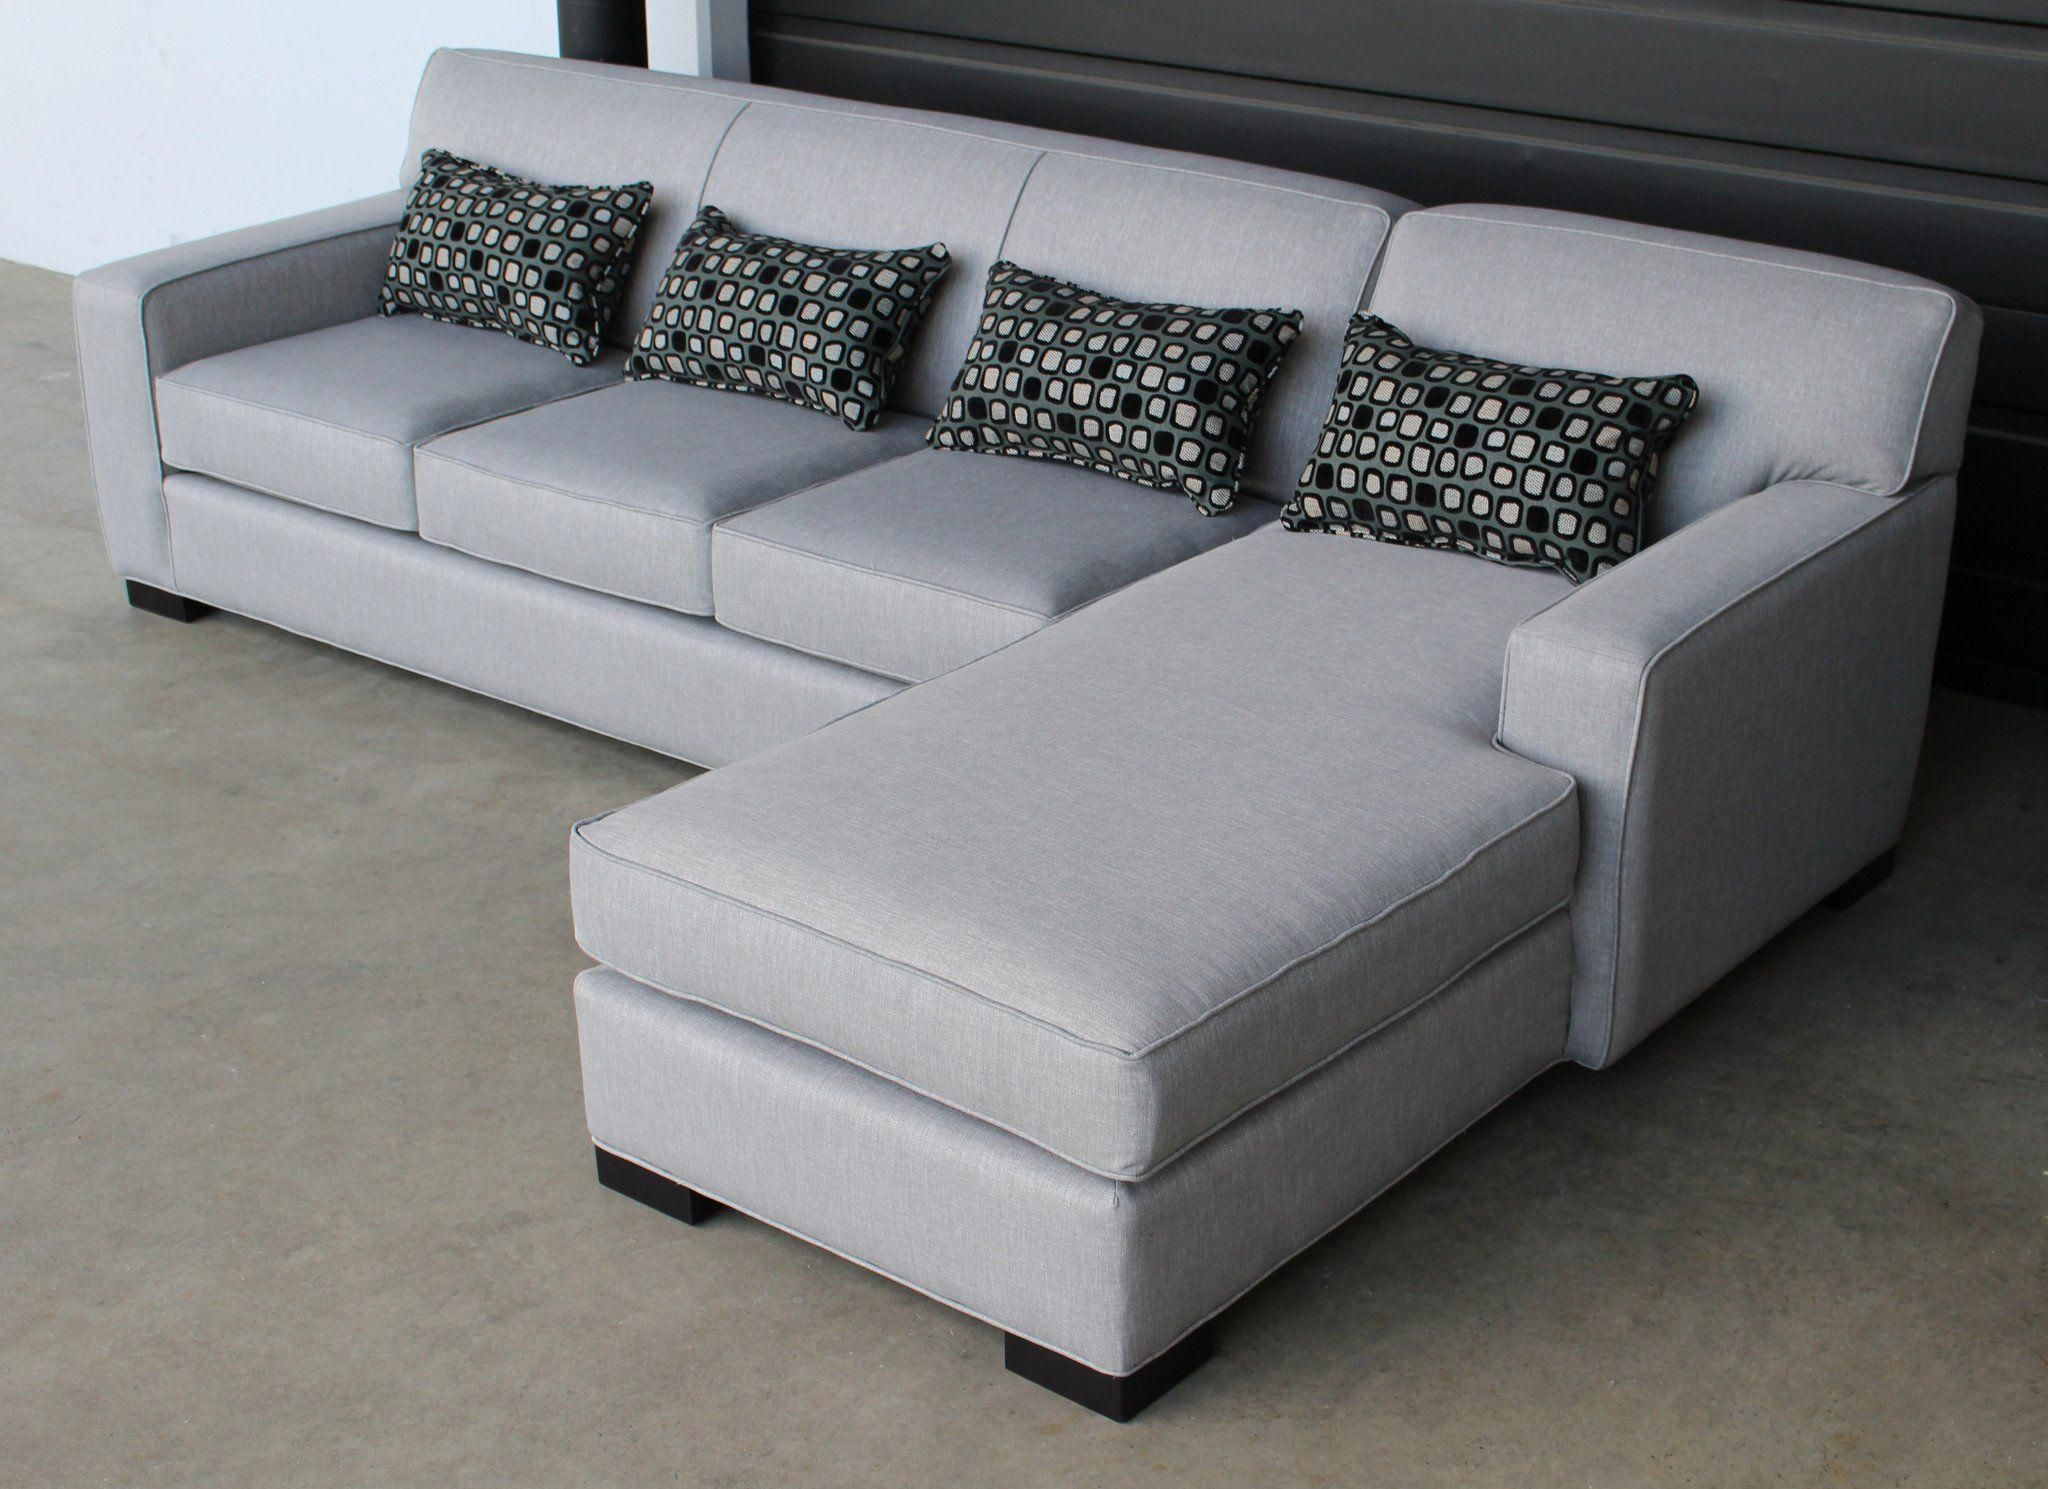 Carpets Of Dalton Furniture Id 5647130764 Corner Sofa Design Living Room Sofa Design Sofa Bed Design